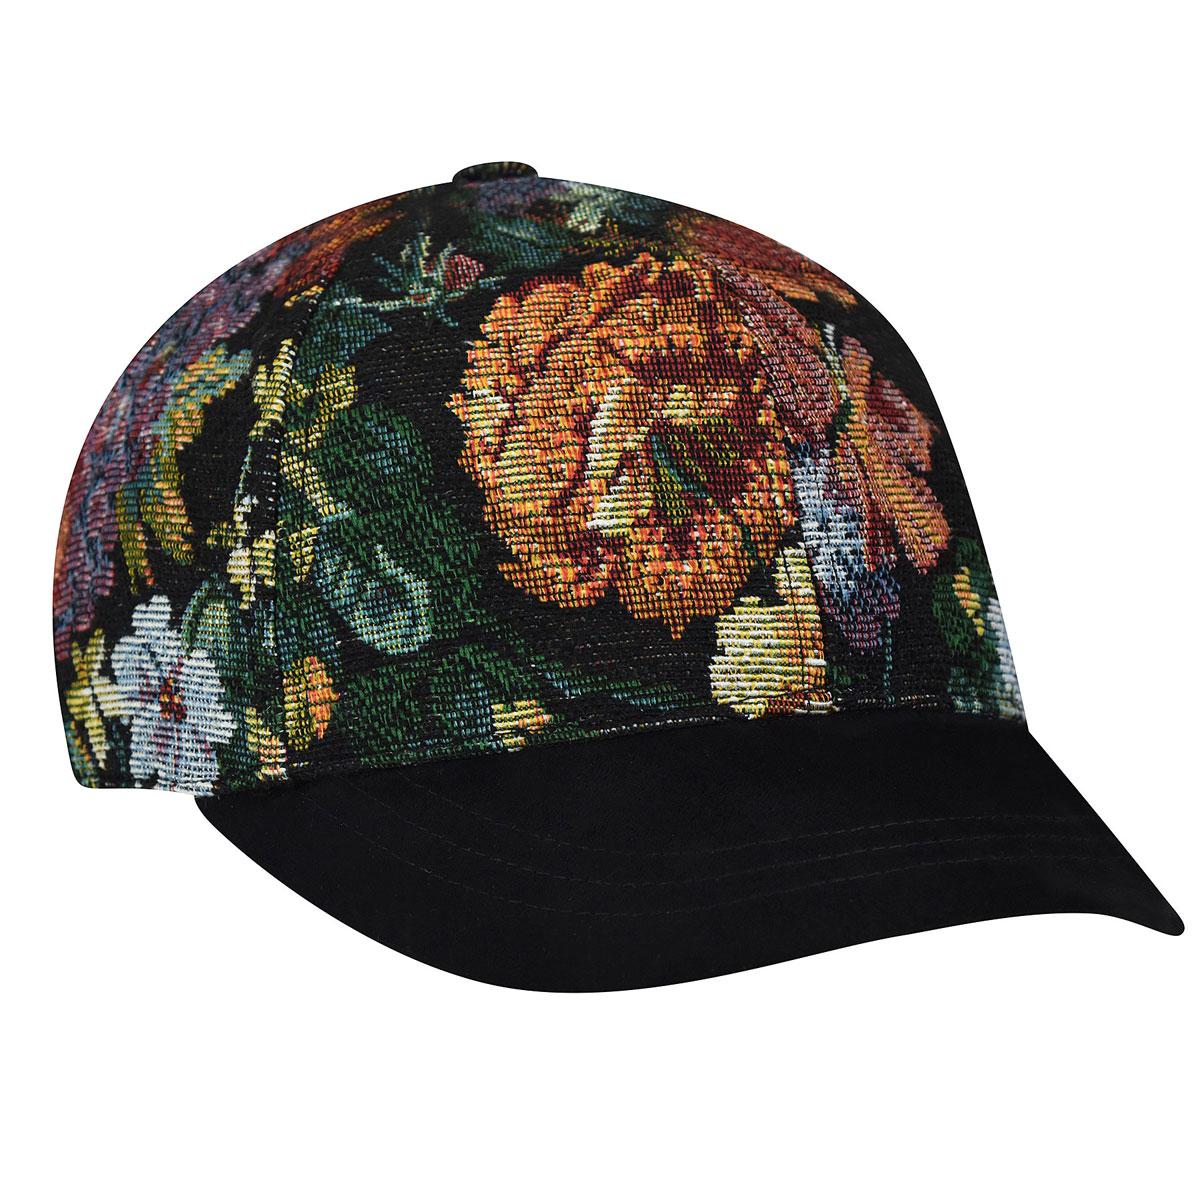 Betmar Floral Baseball Cap in Floral Multi